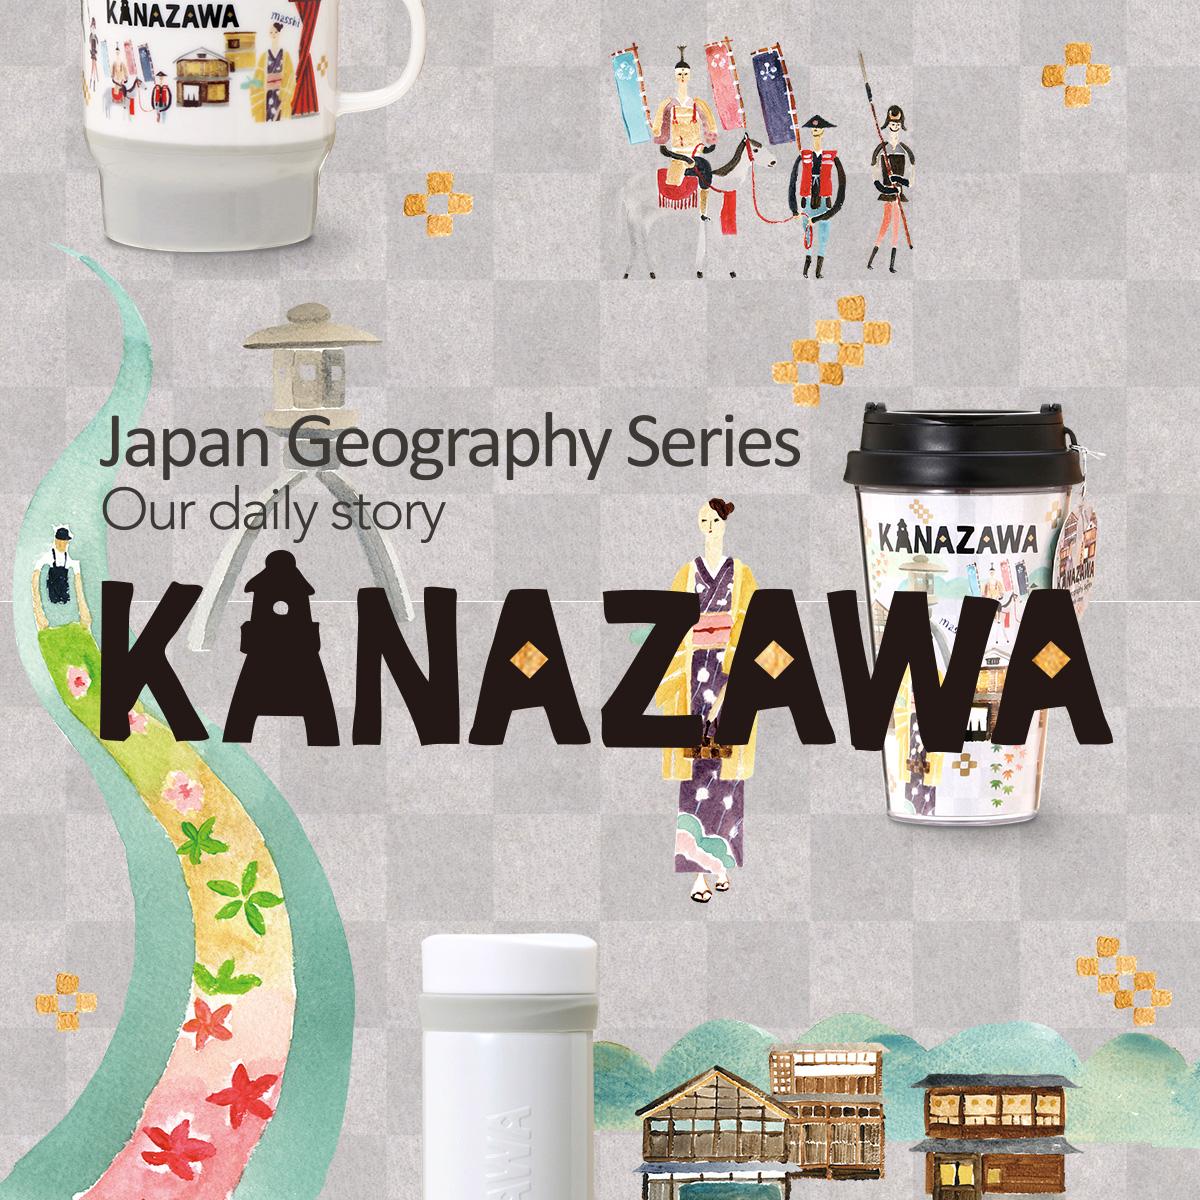 Japan Geography Series 金沢